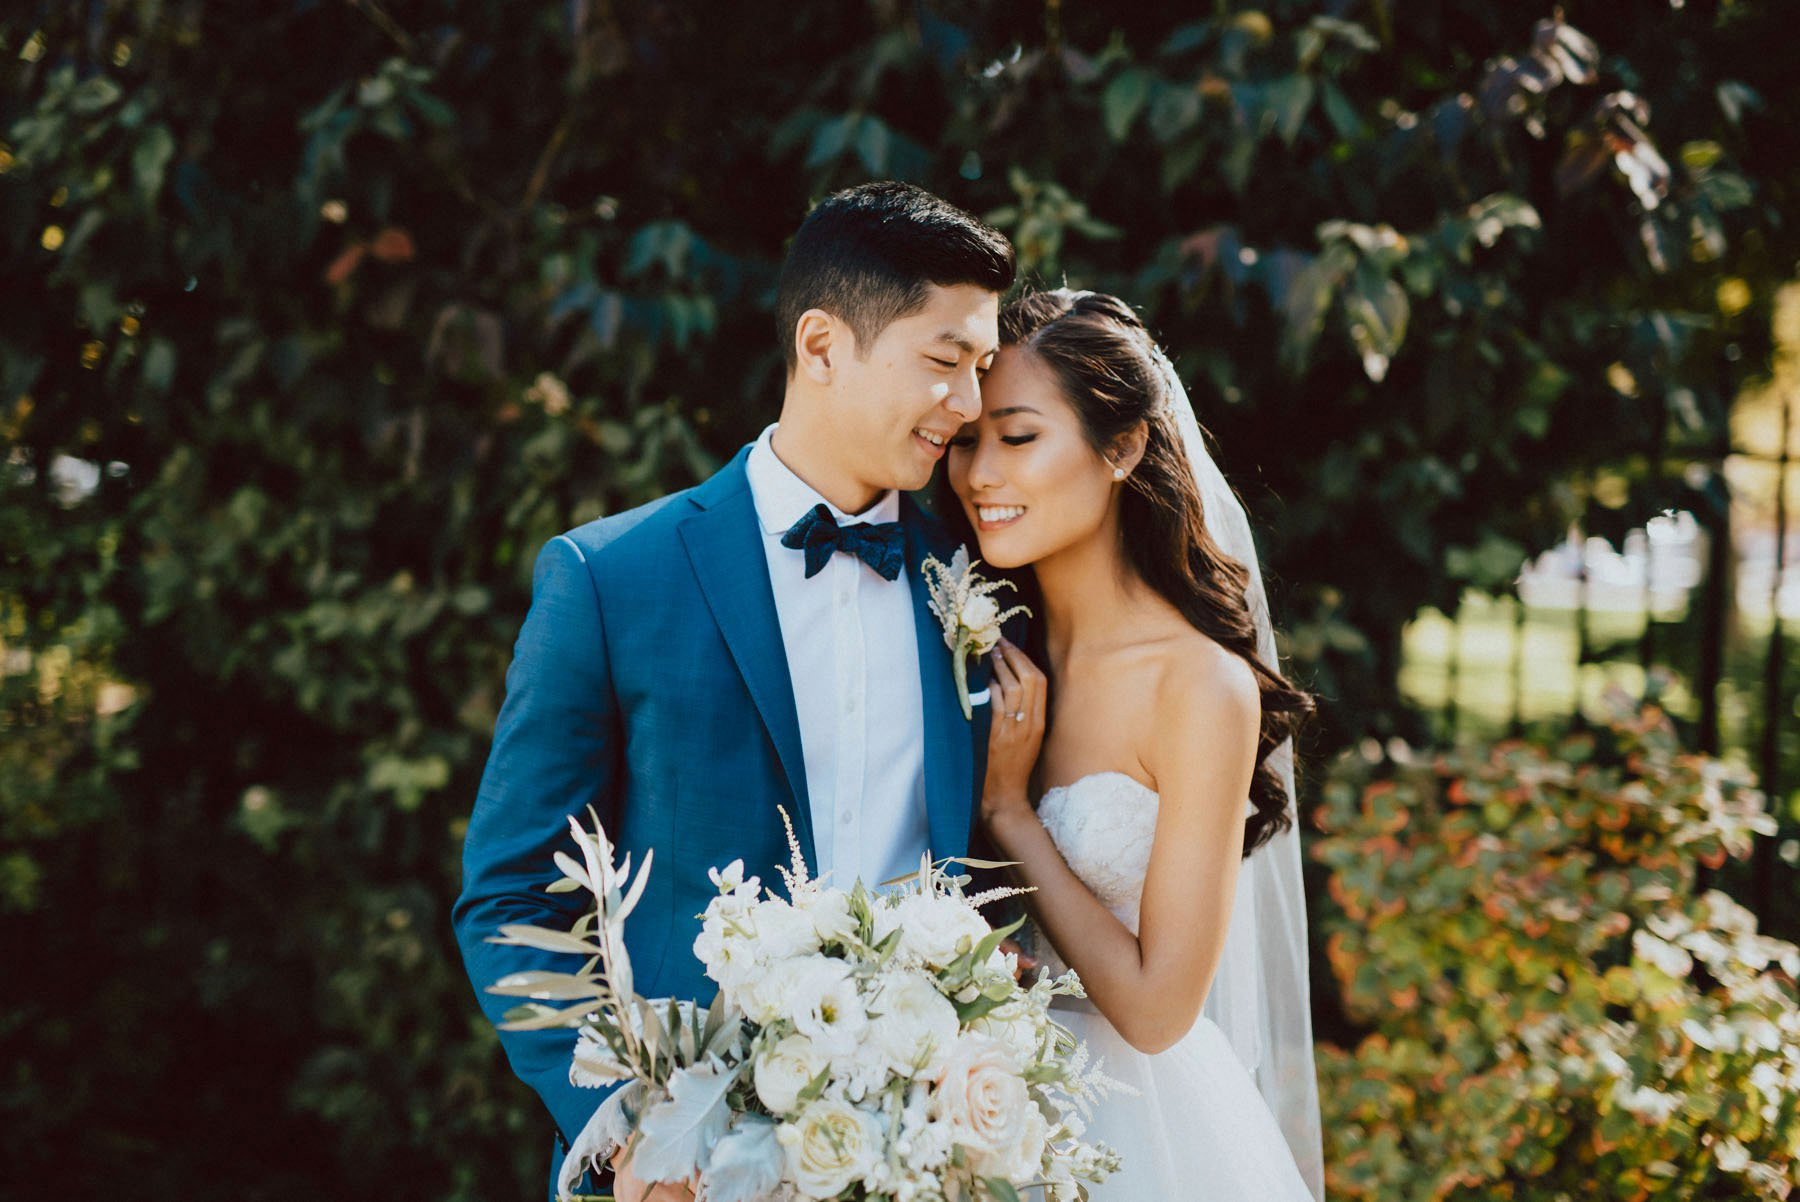 philadelphia-wedding-photographer-62.jpg